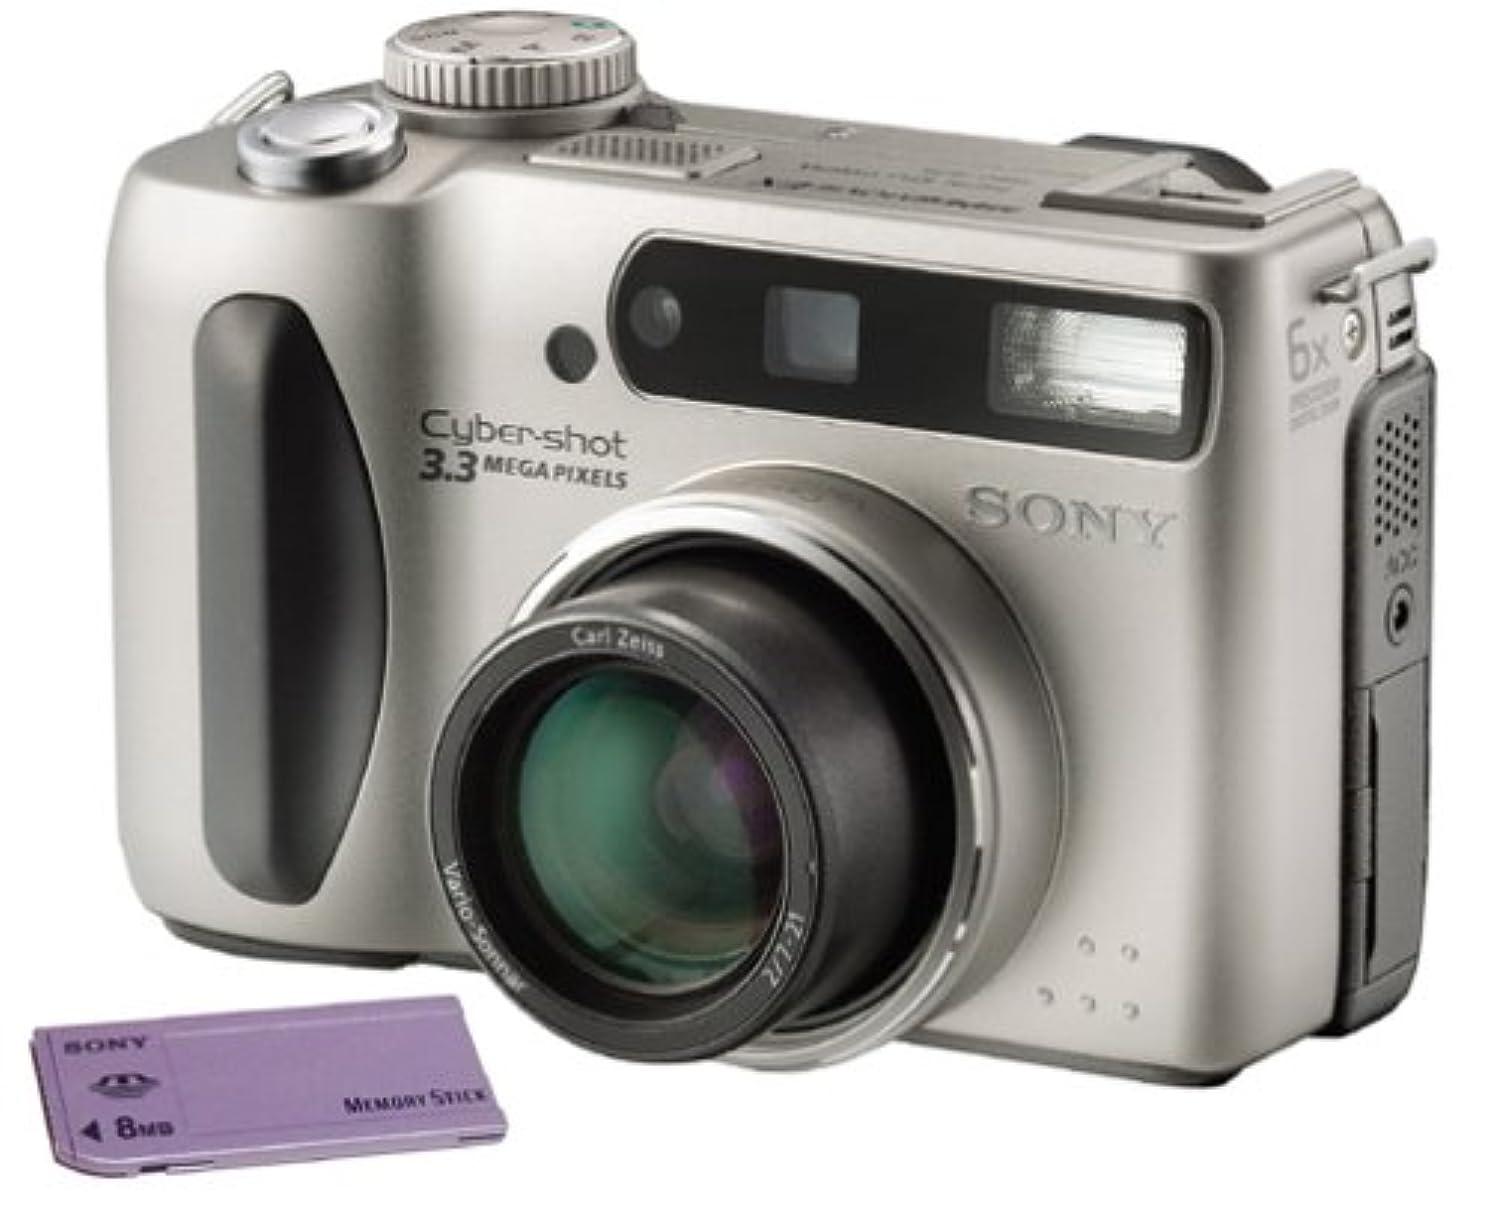 Sony DSCS75 Cyber-shot 3MP Digital Camera w/ 3x Optical Zoom